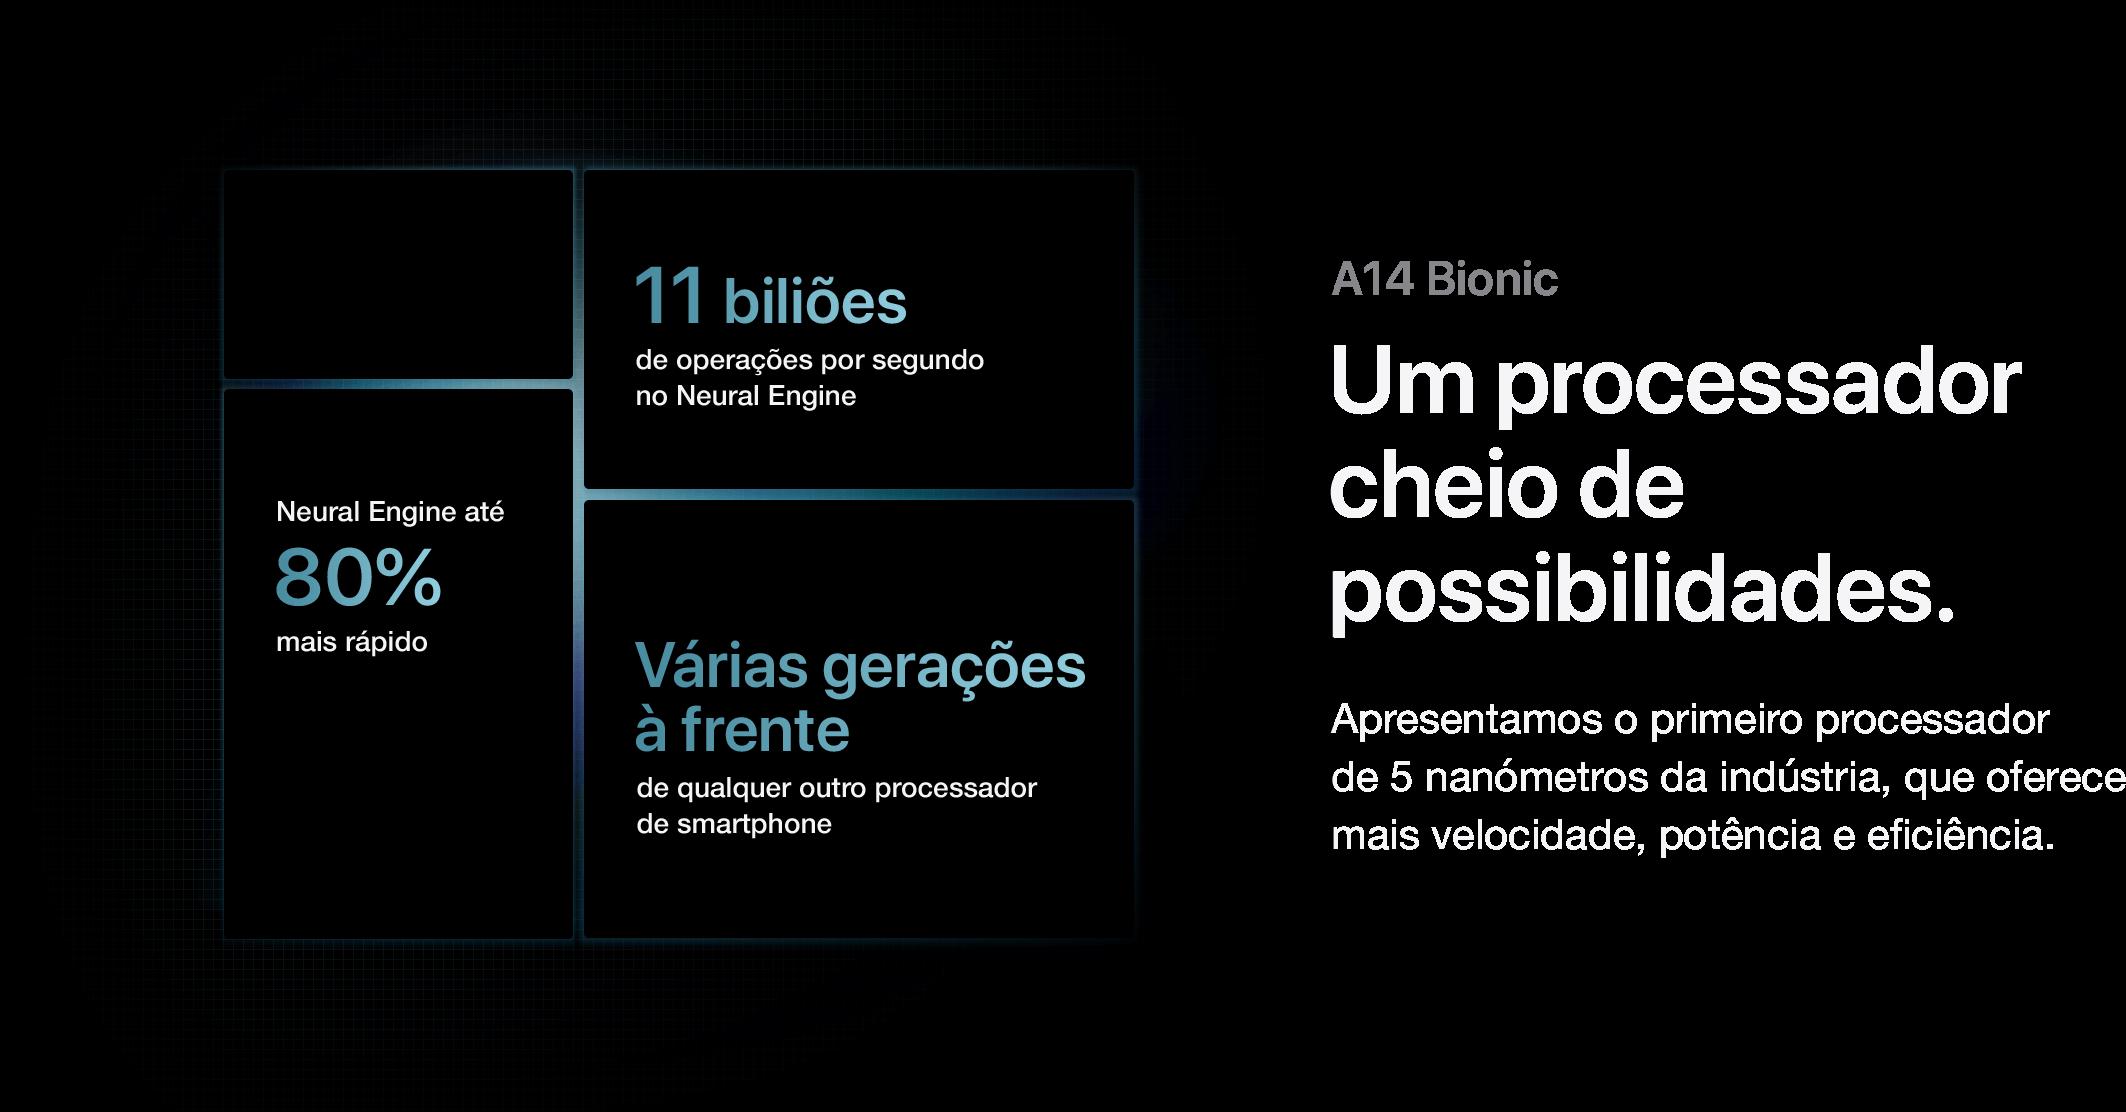 iPhone 12 Pro e iPhone 12 Processador A14 Bionic